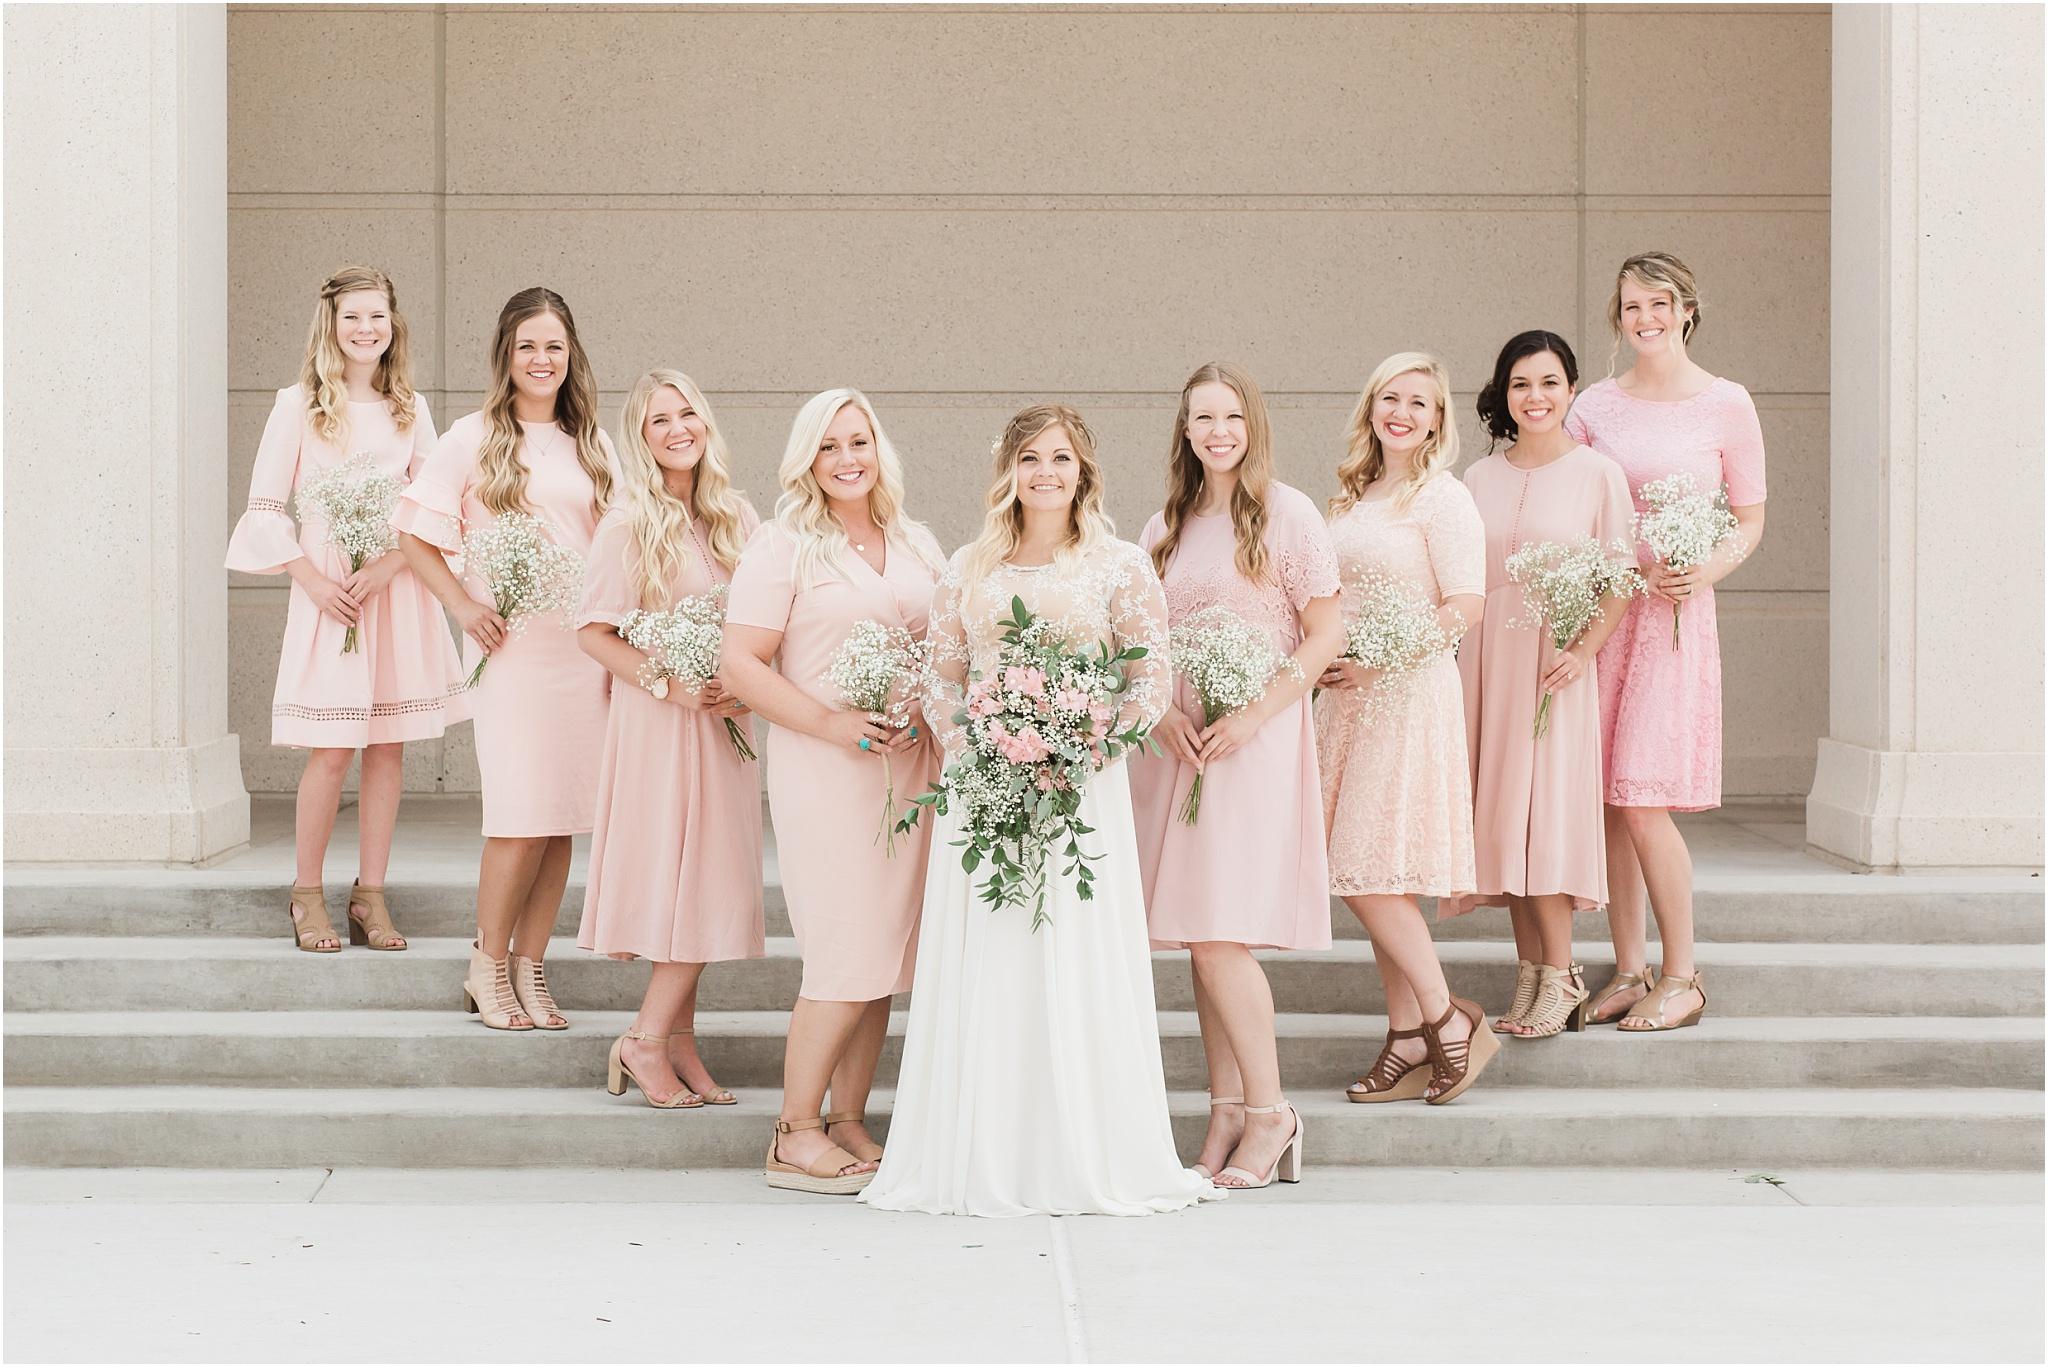 Wedding Photography_Meridian Idaho Temple_Boise Idaho_Nampa Idaho_Leah Southwick Photography_0033.jpg